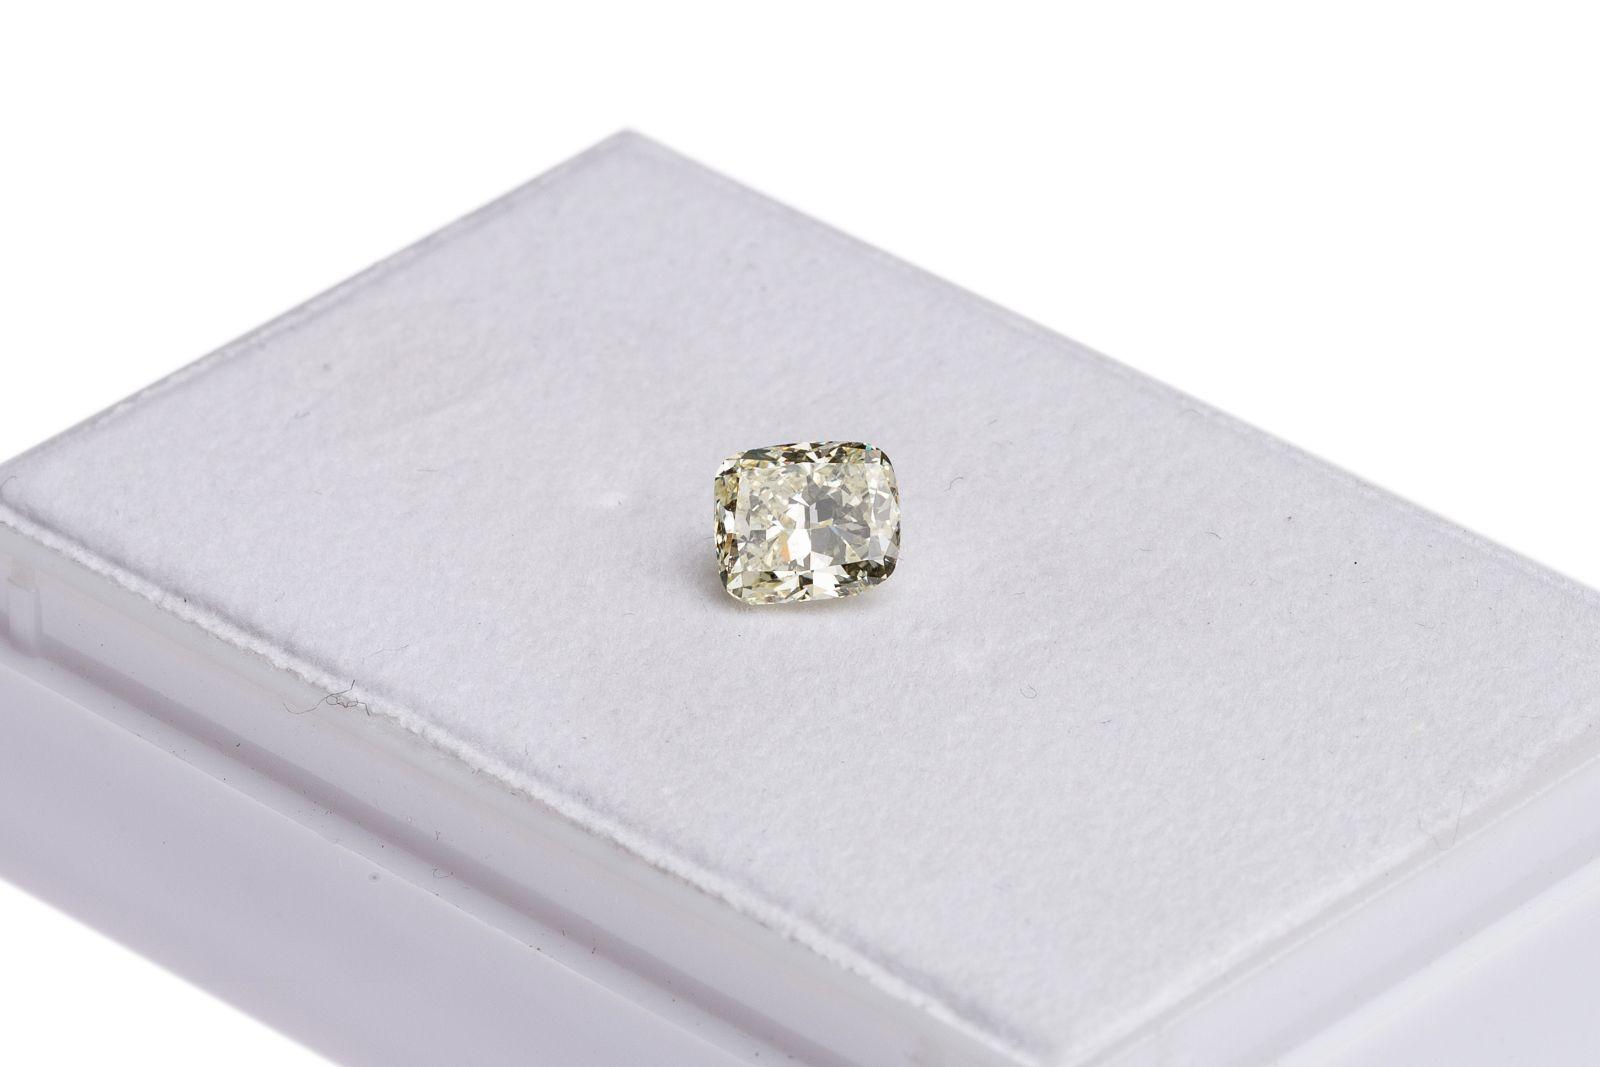 #182 diamond | Loser Diamant Image